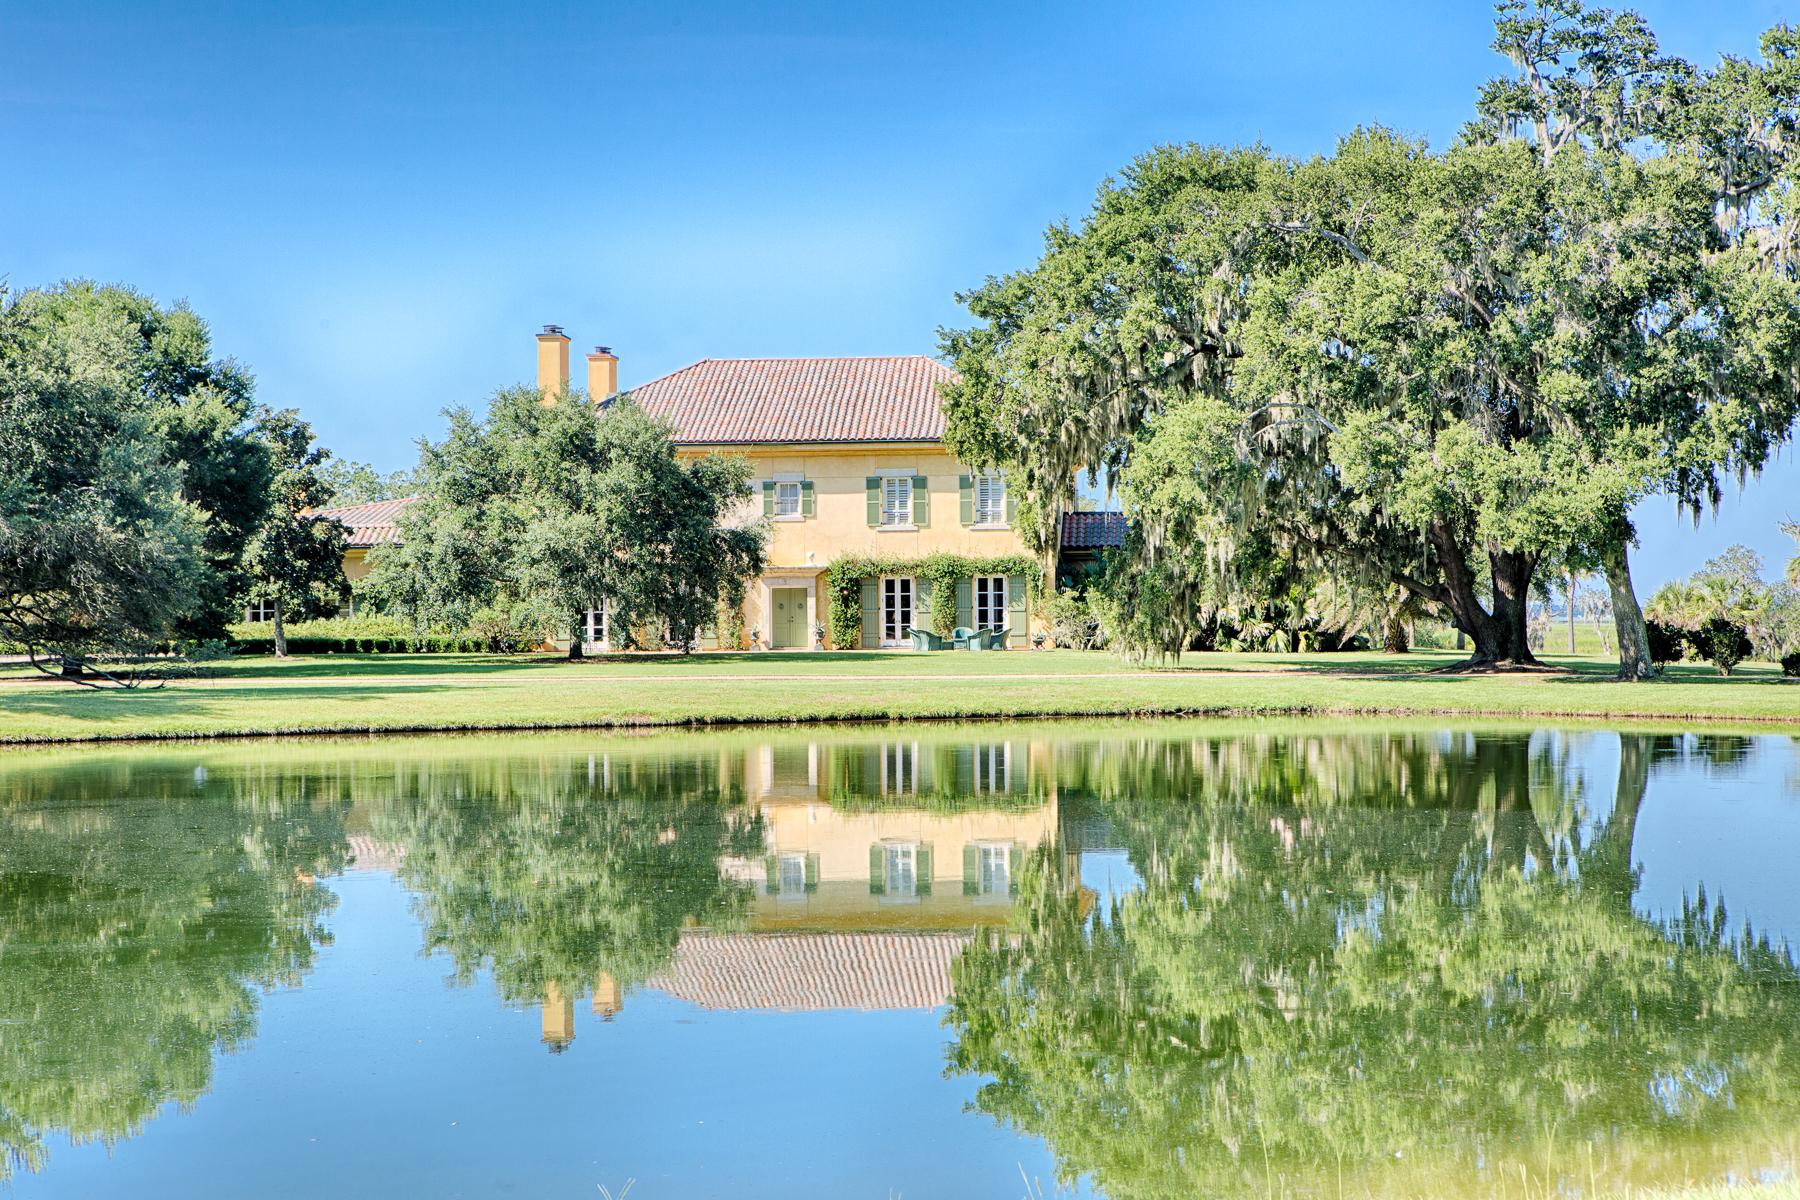 Single Family Homes for Sale at 120 Oaks Plantation Road St. Helena Island, South Carolina 29920 United States